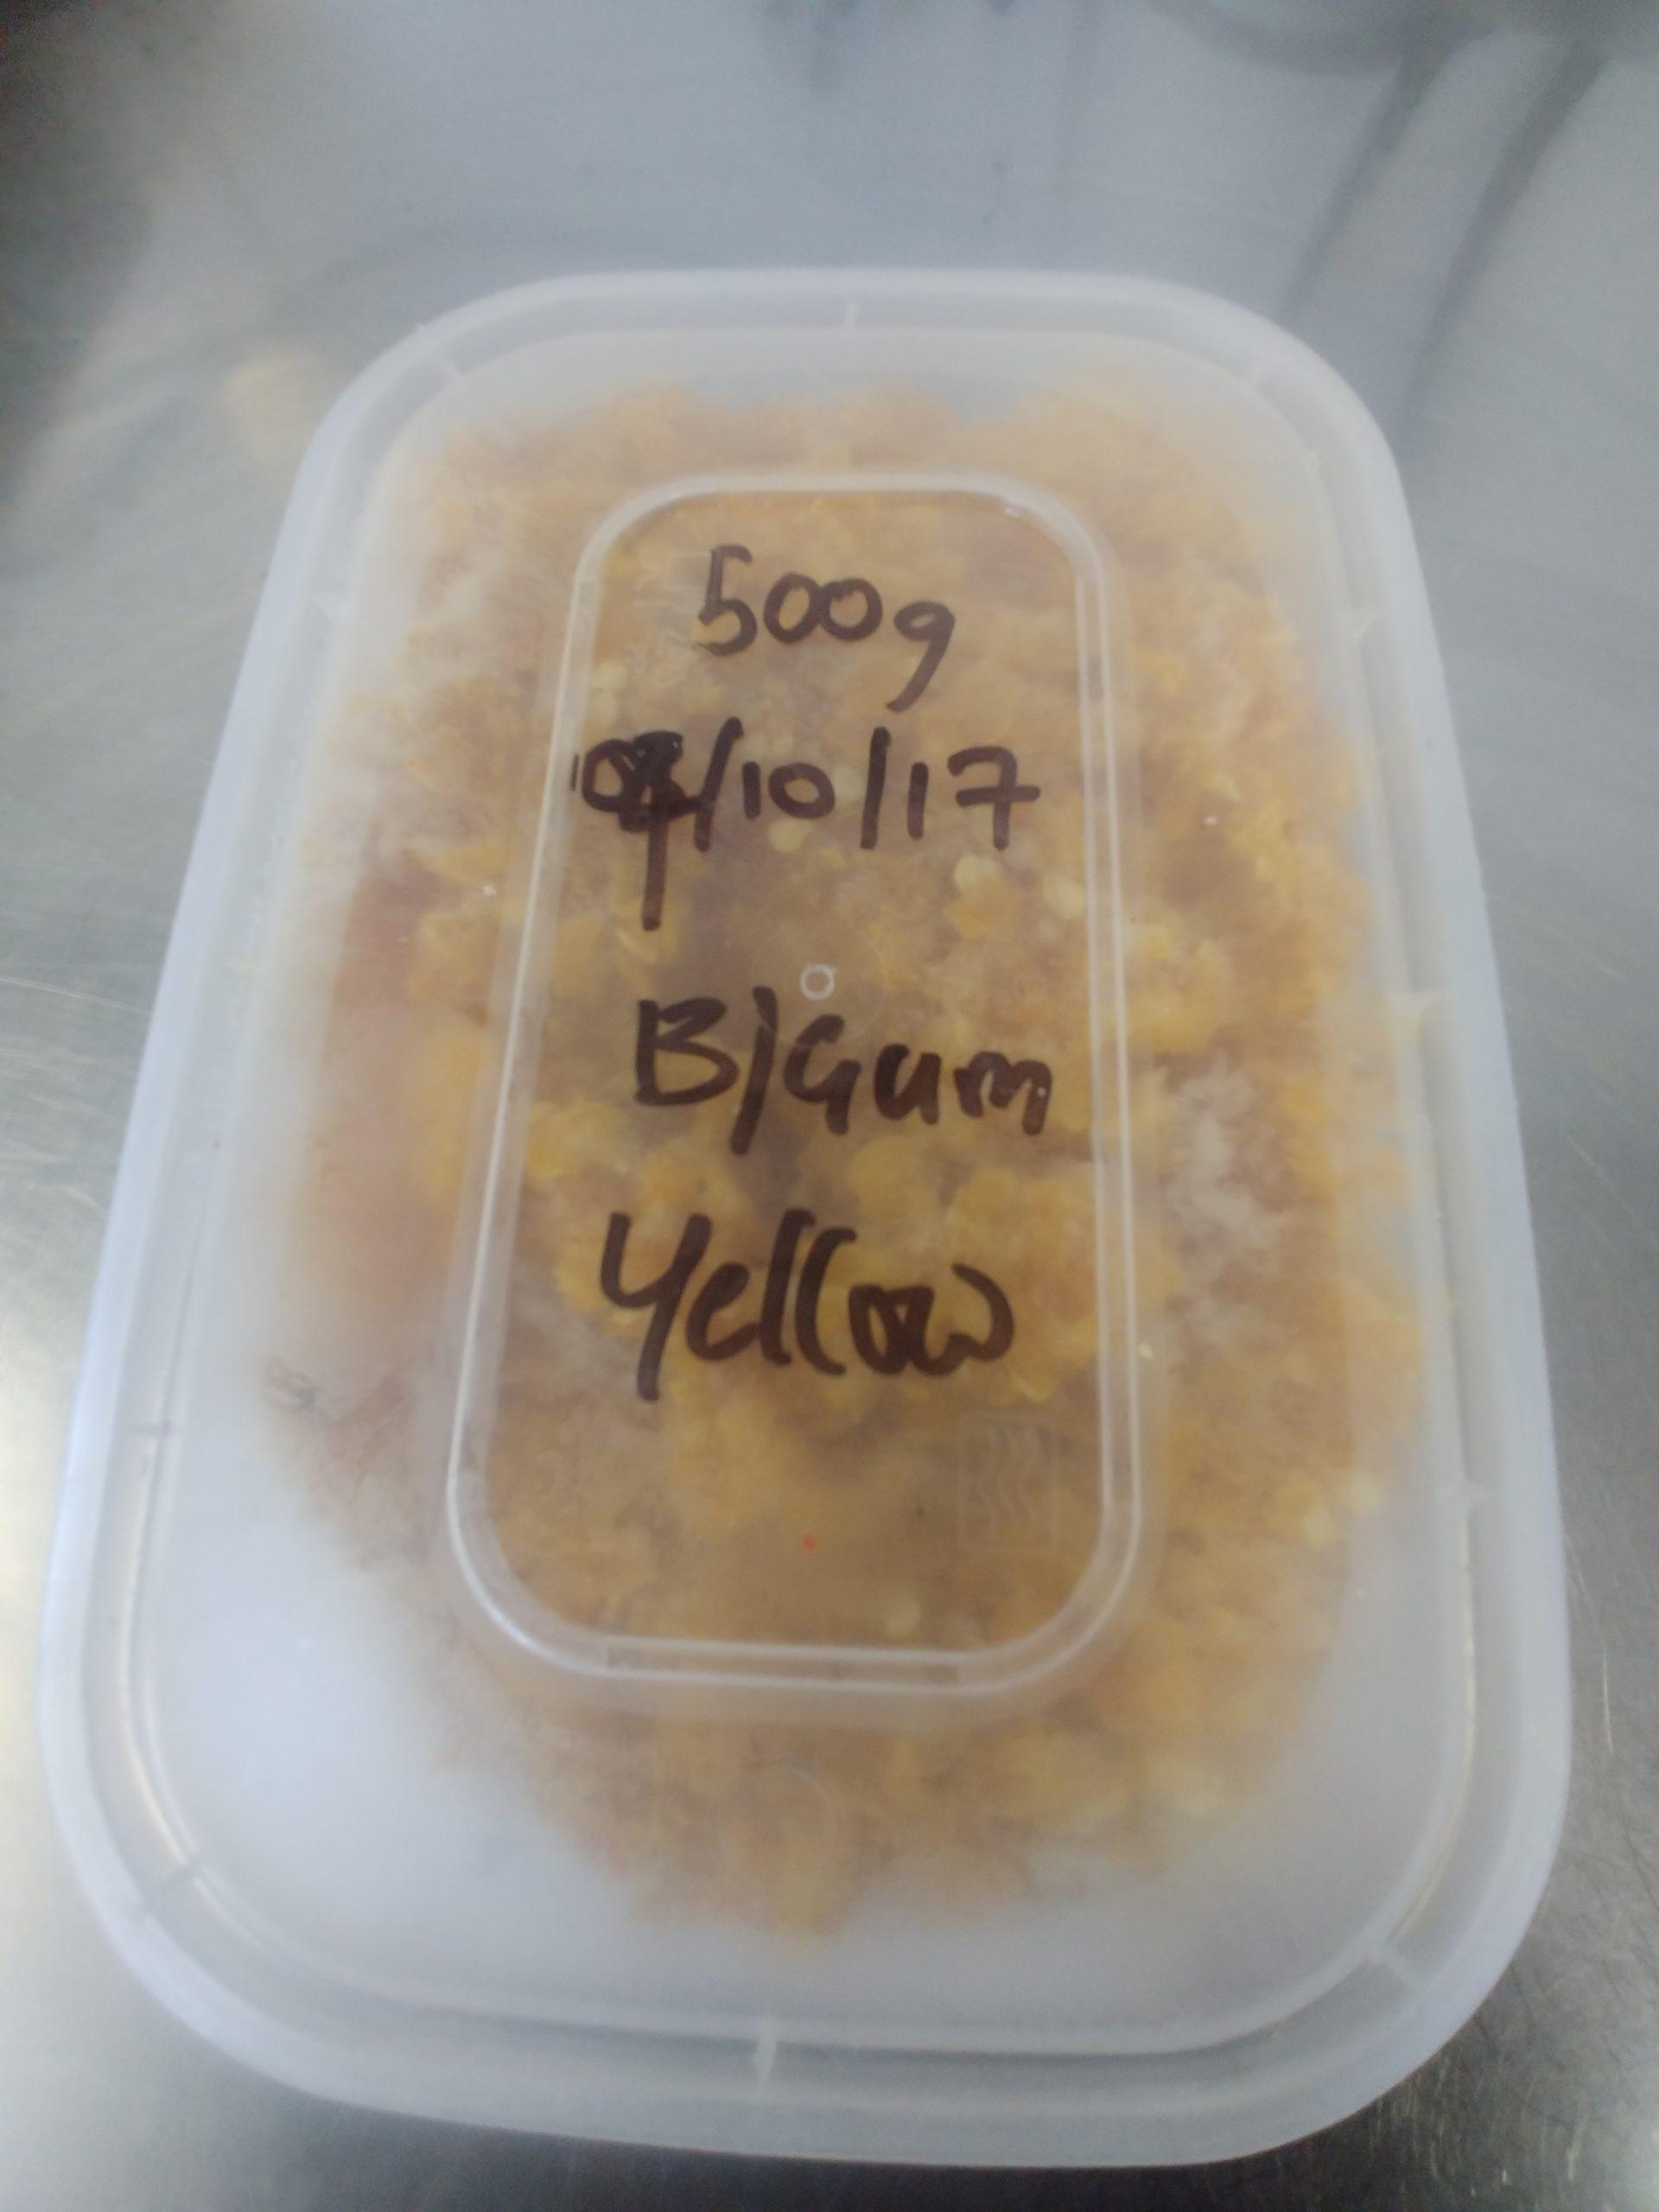 A frozen tub of 500g of Bubblegum Yellow chillies.